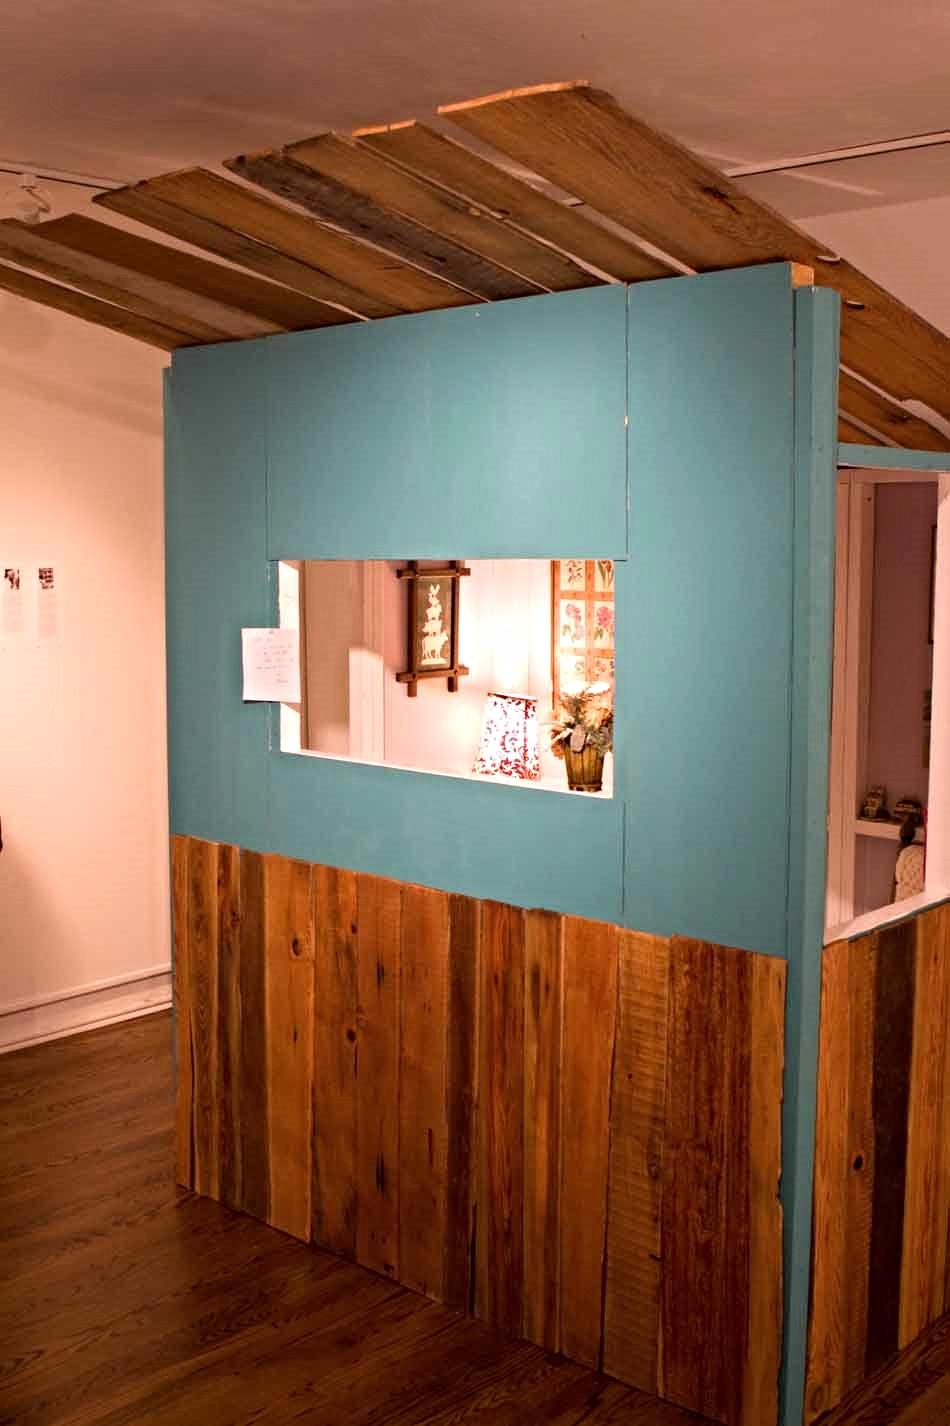 Kiosk: Rent-a-Grandma, 2012, exterior, installation at the Philadelphia Art Alliance, collaboration with Amy Linsenmayer